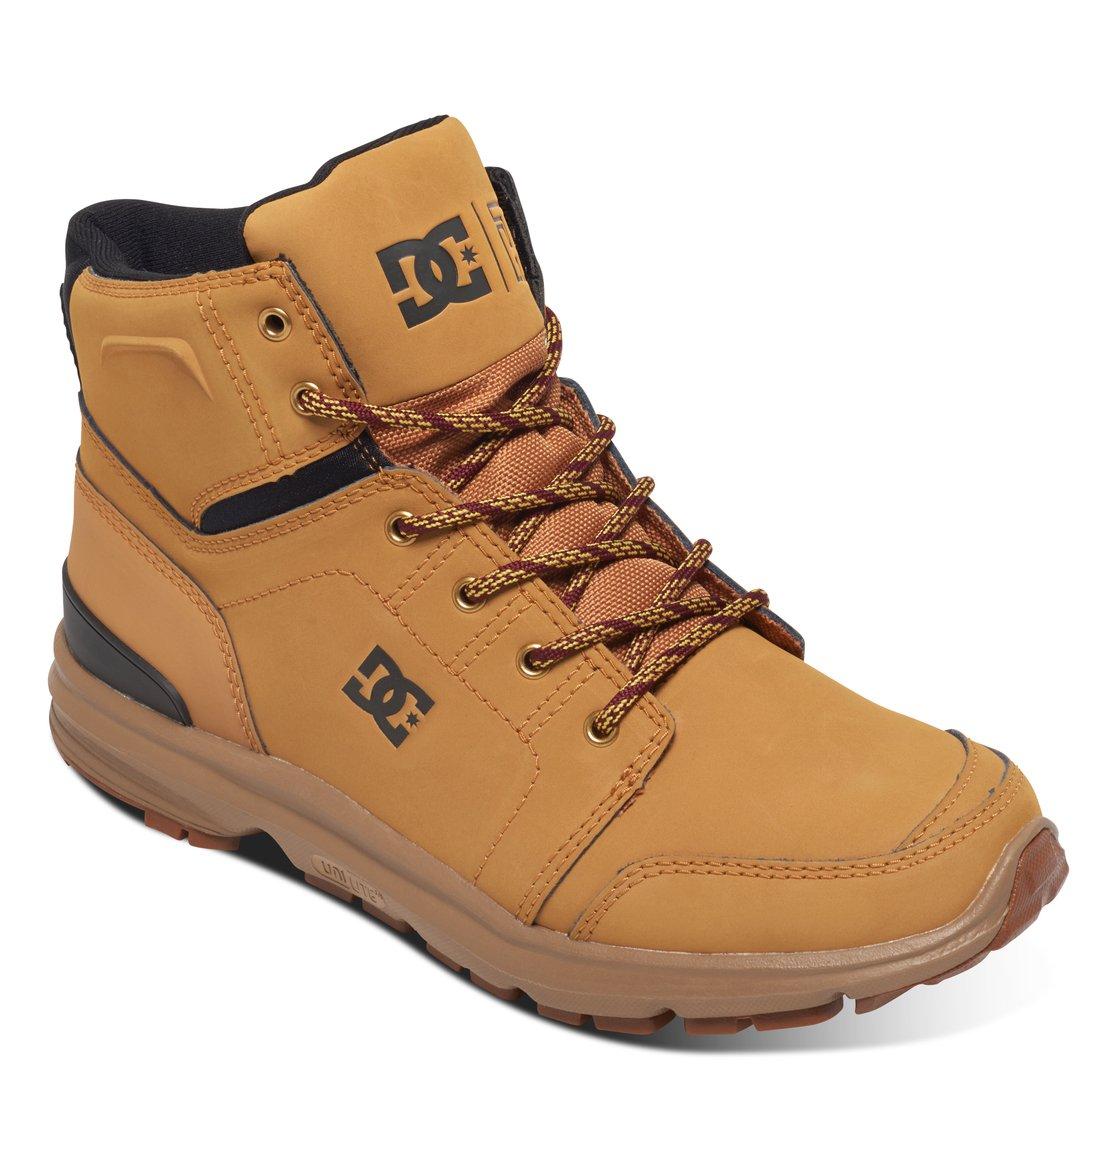 Ботинки Dc Spartan High Wr M Boot Fw17 Brown/brown/red 8